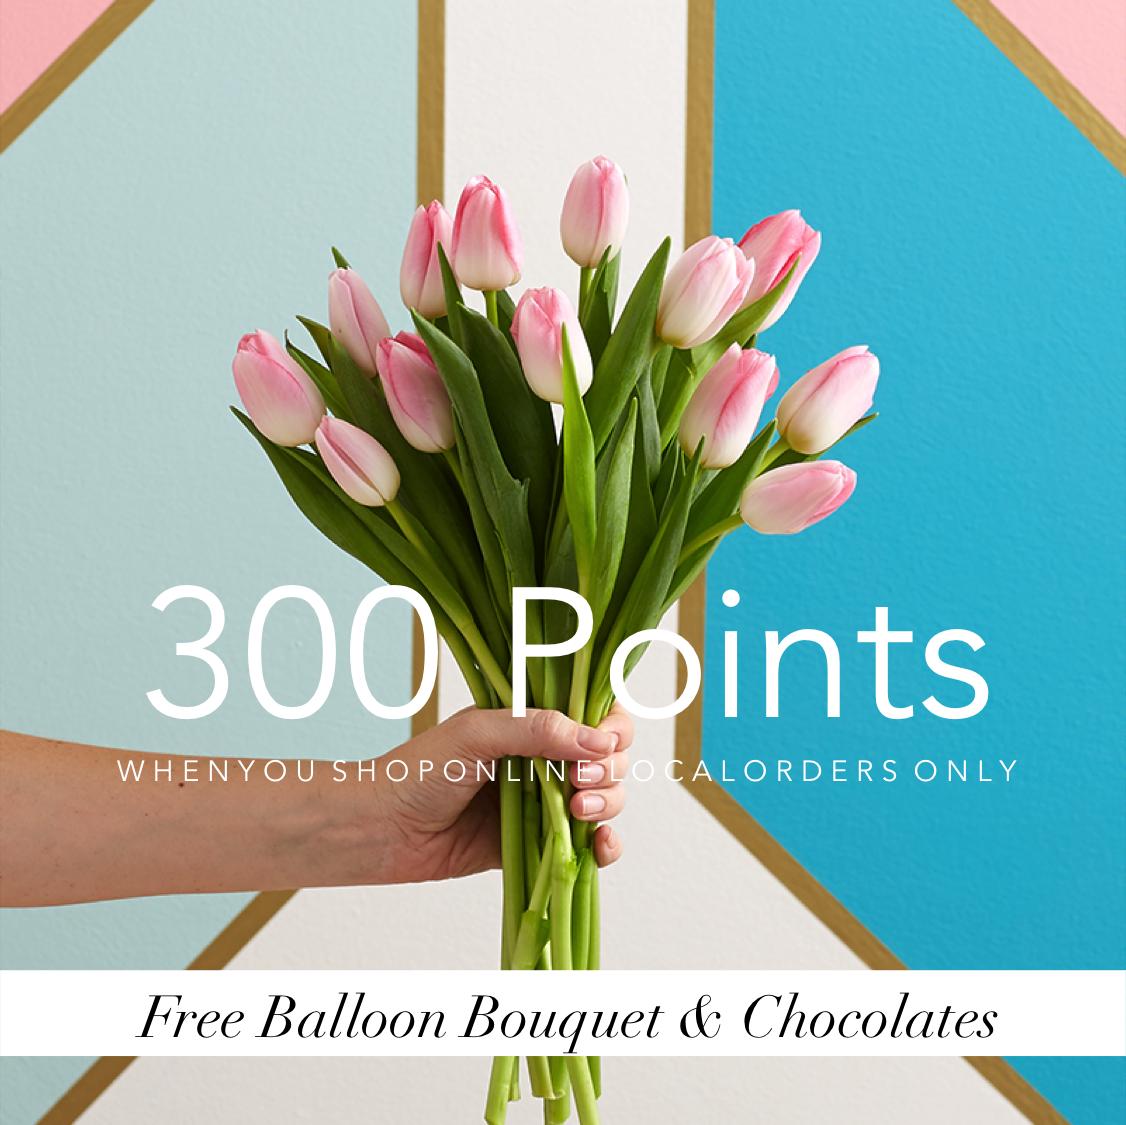 reward-points-1-angie-s-floral-designs-el-paso-florist-floreria-el-paso-angie-s-floral-designs-shop-flowers-online-el-paso-delivery-.png